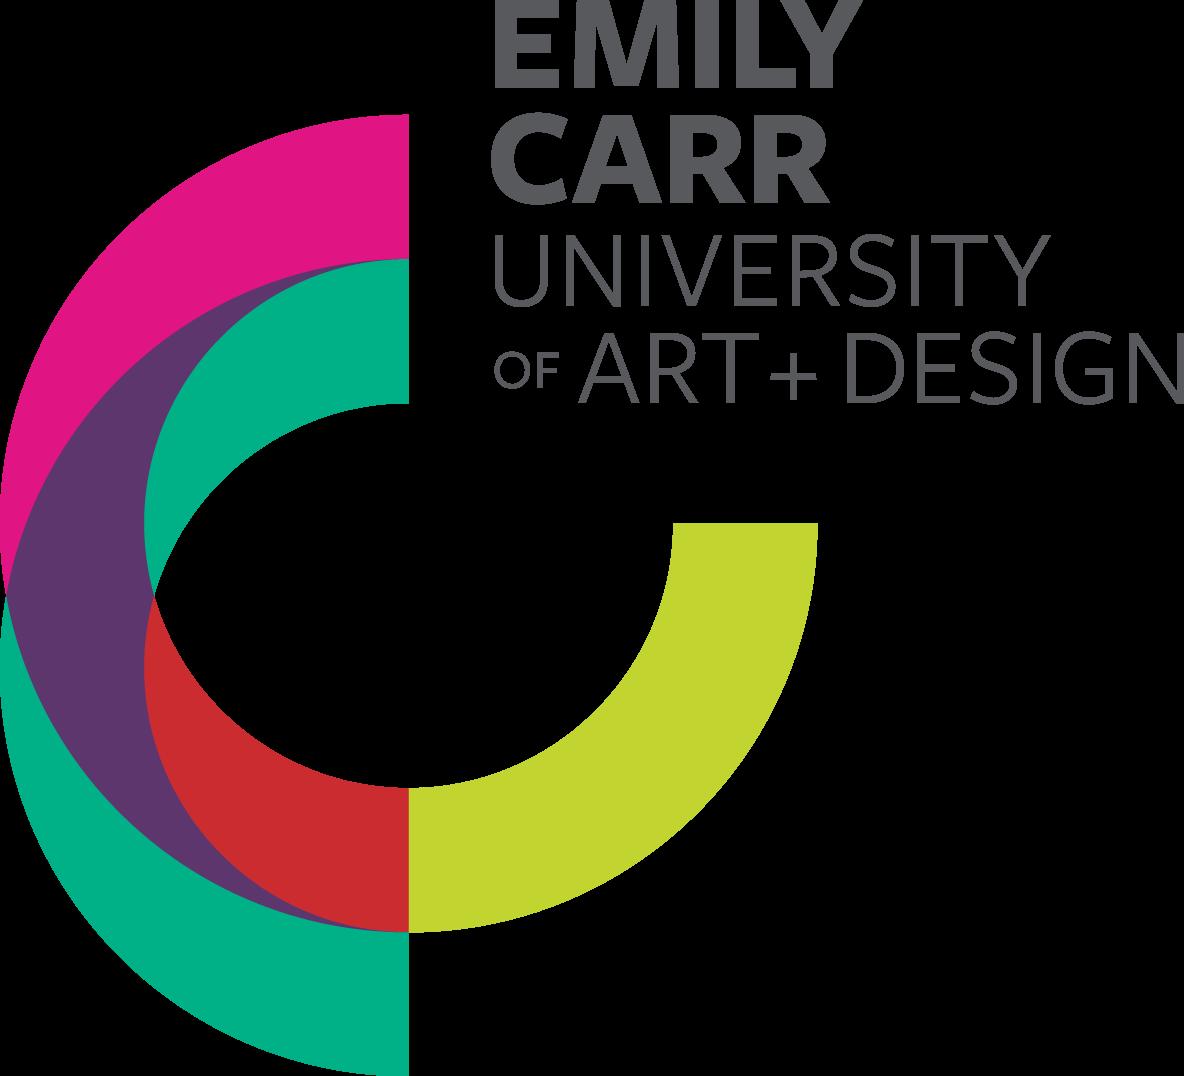 university ecuad emily carr rgb logos sponsors conference pdf